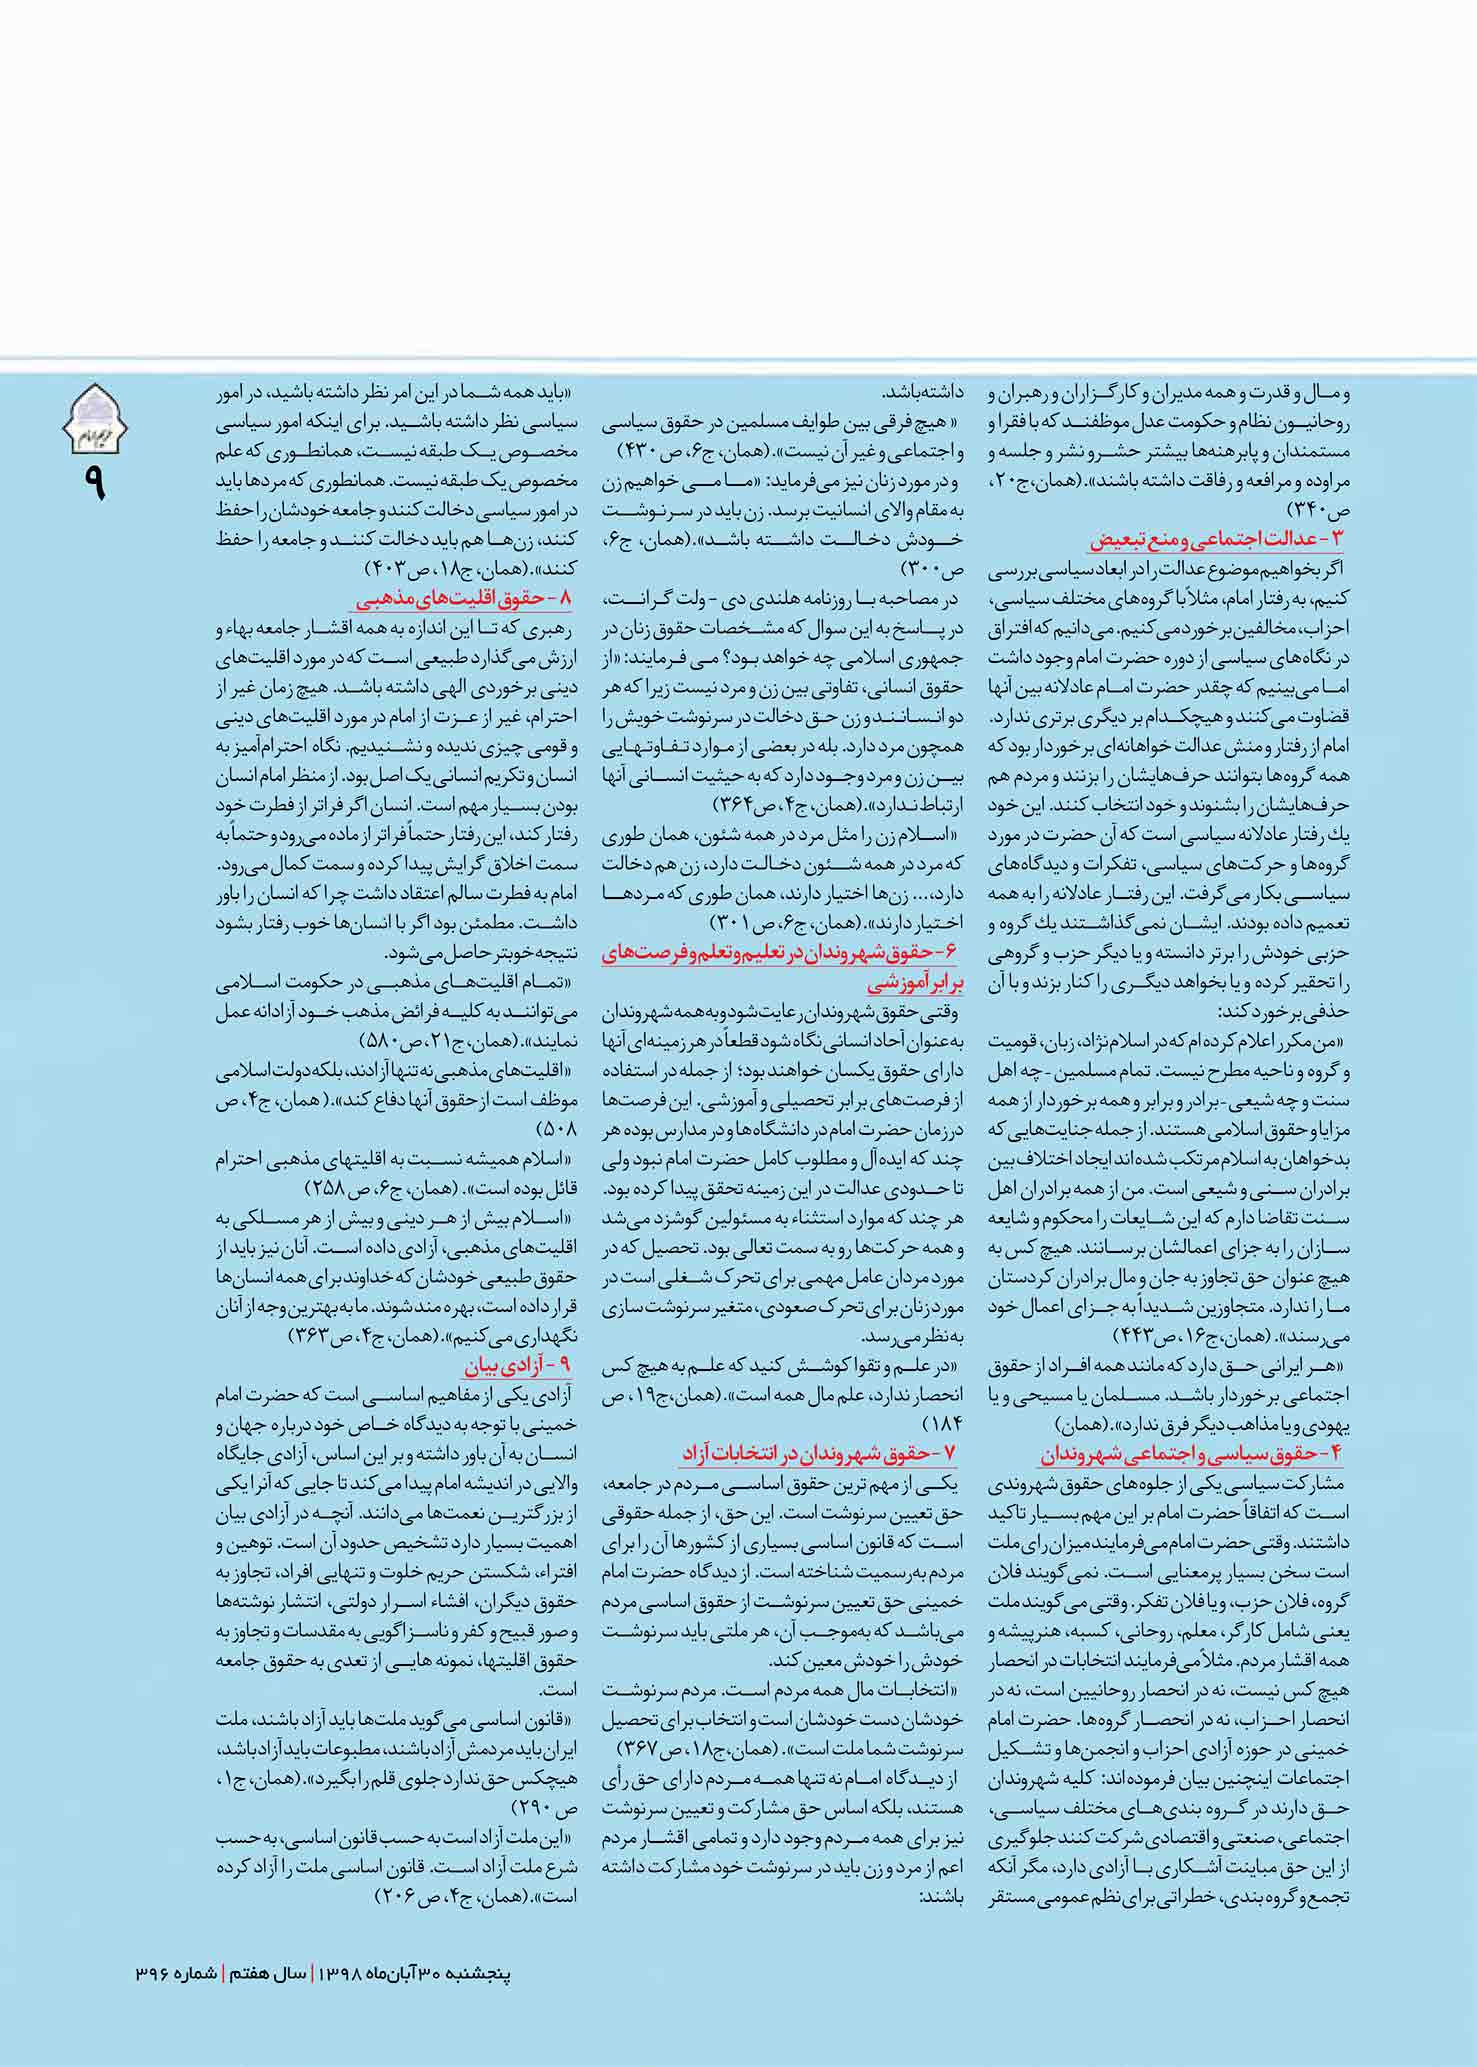 C:\Users\a.khalojini.ICPIKW\Desktop\396\@harim_emam396-9.jpg